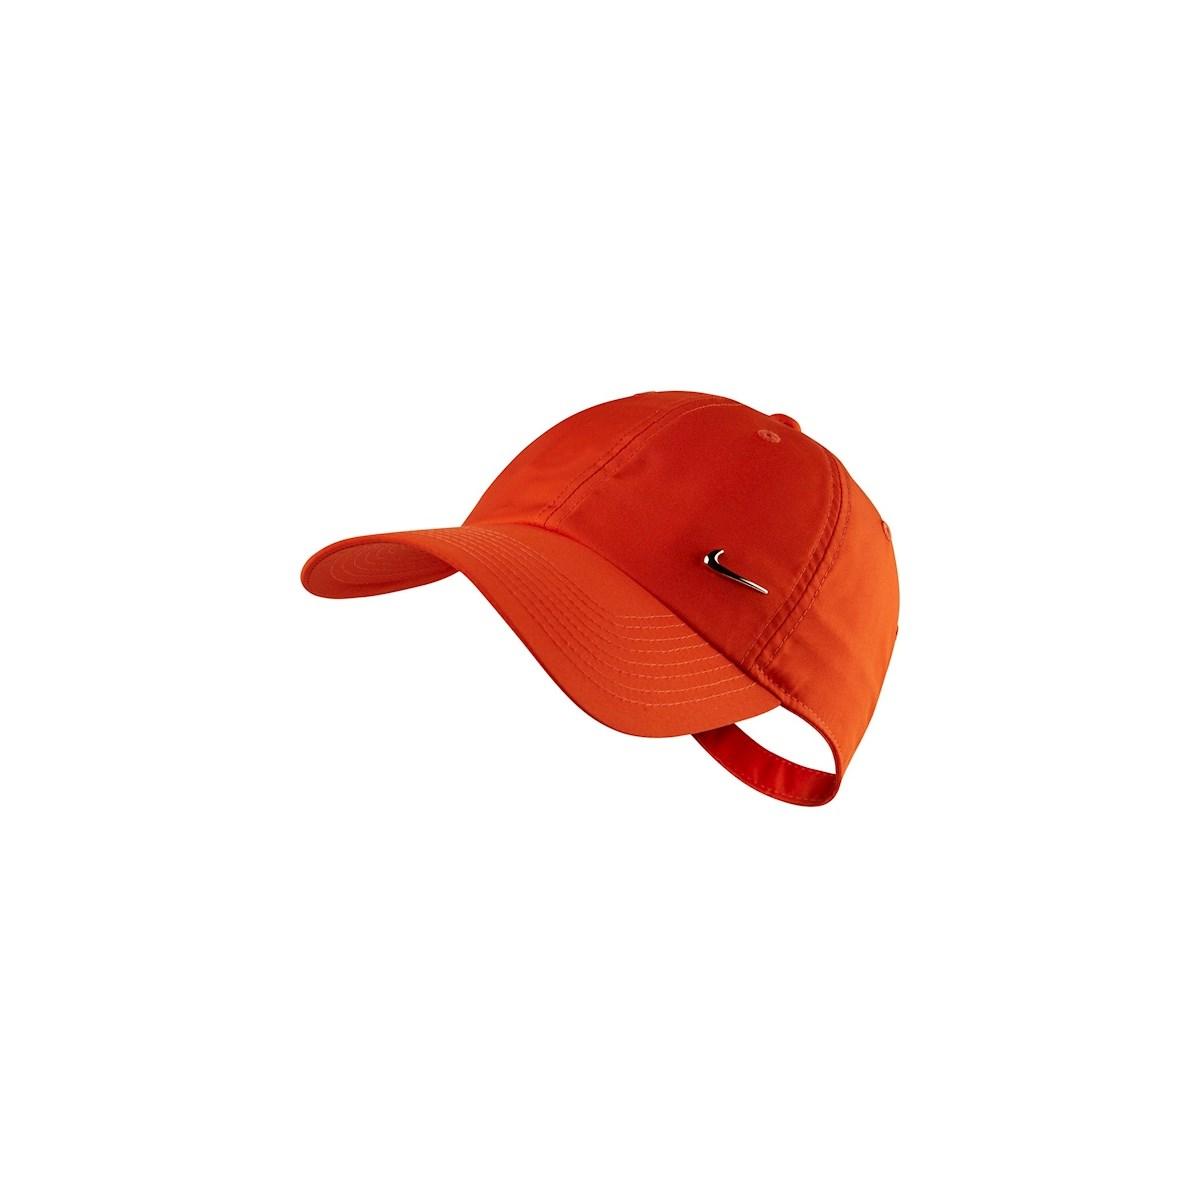 H86 Metal Swoosh Turuncu Spor Şapka (943092-891)